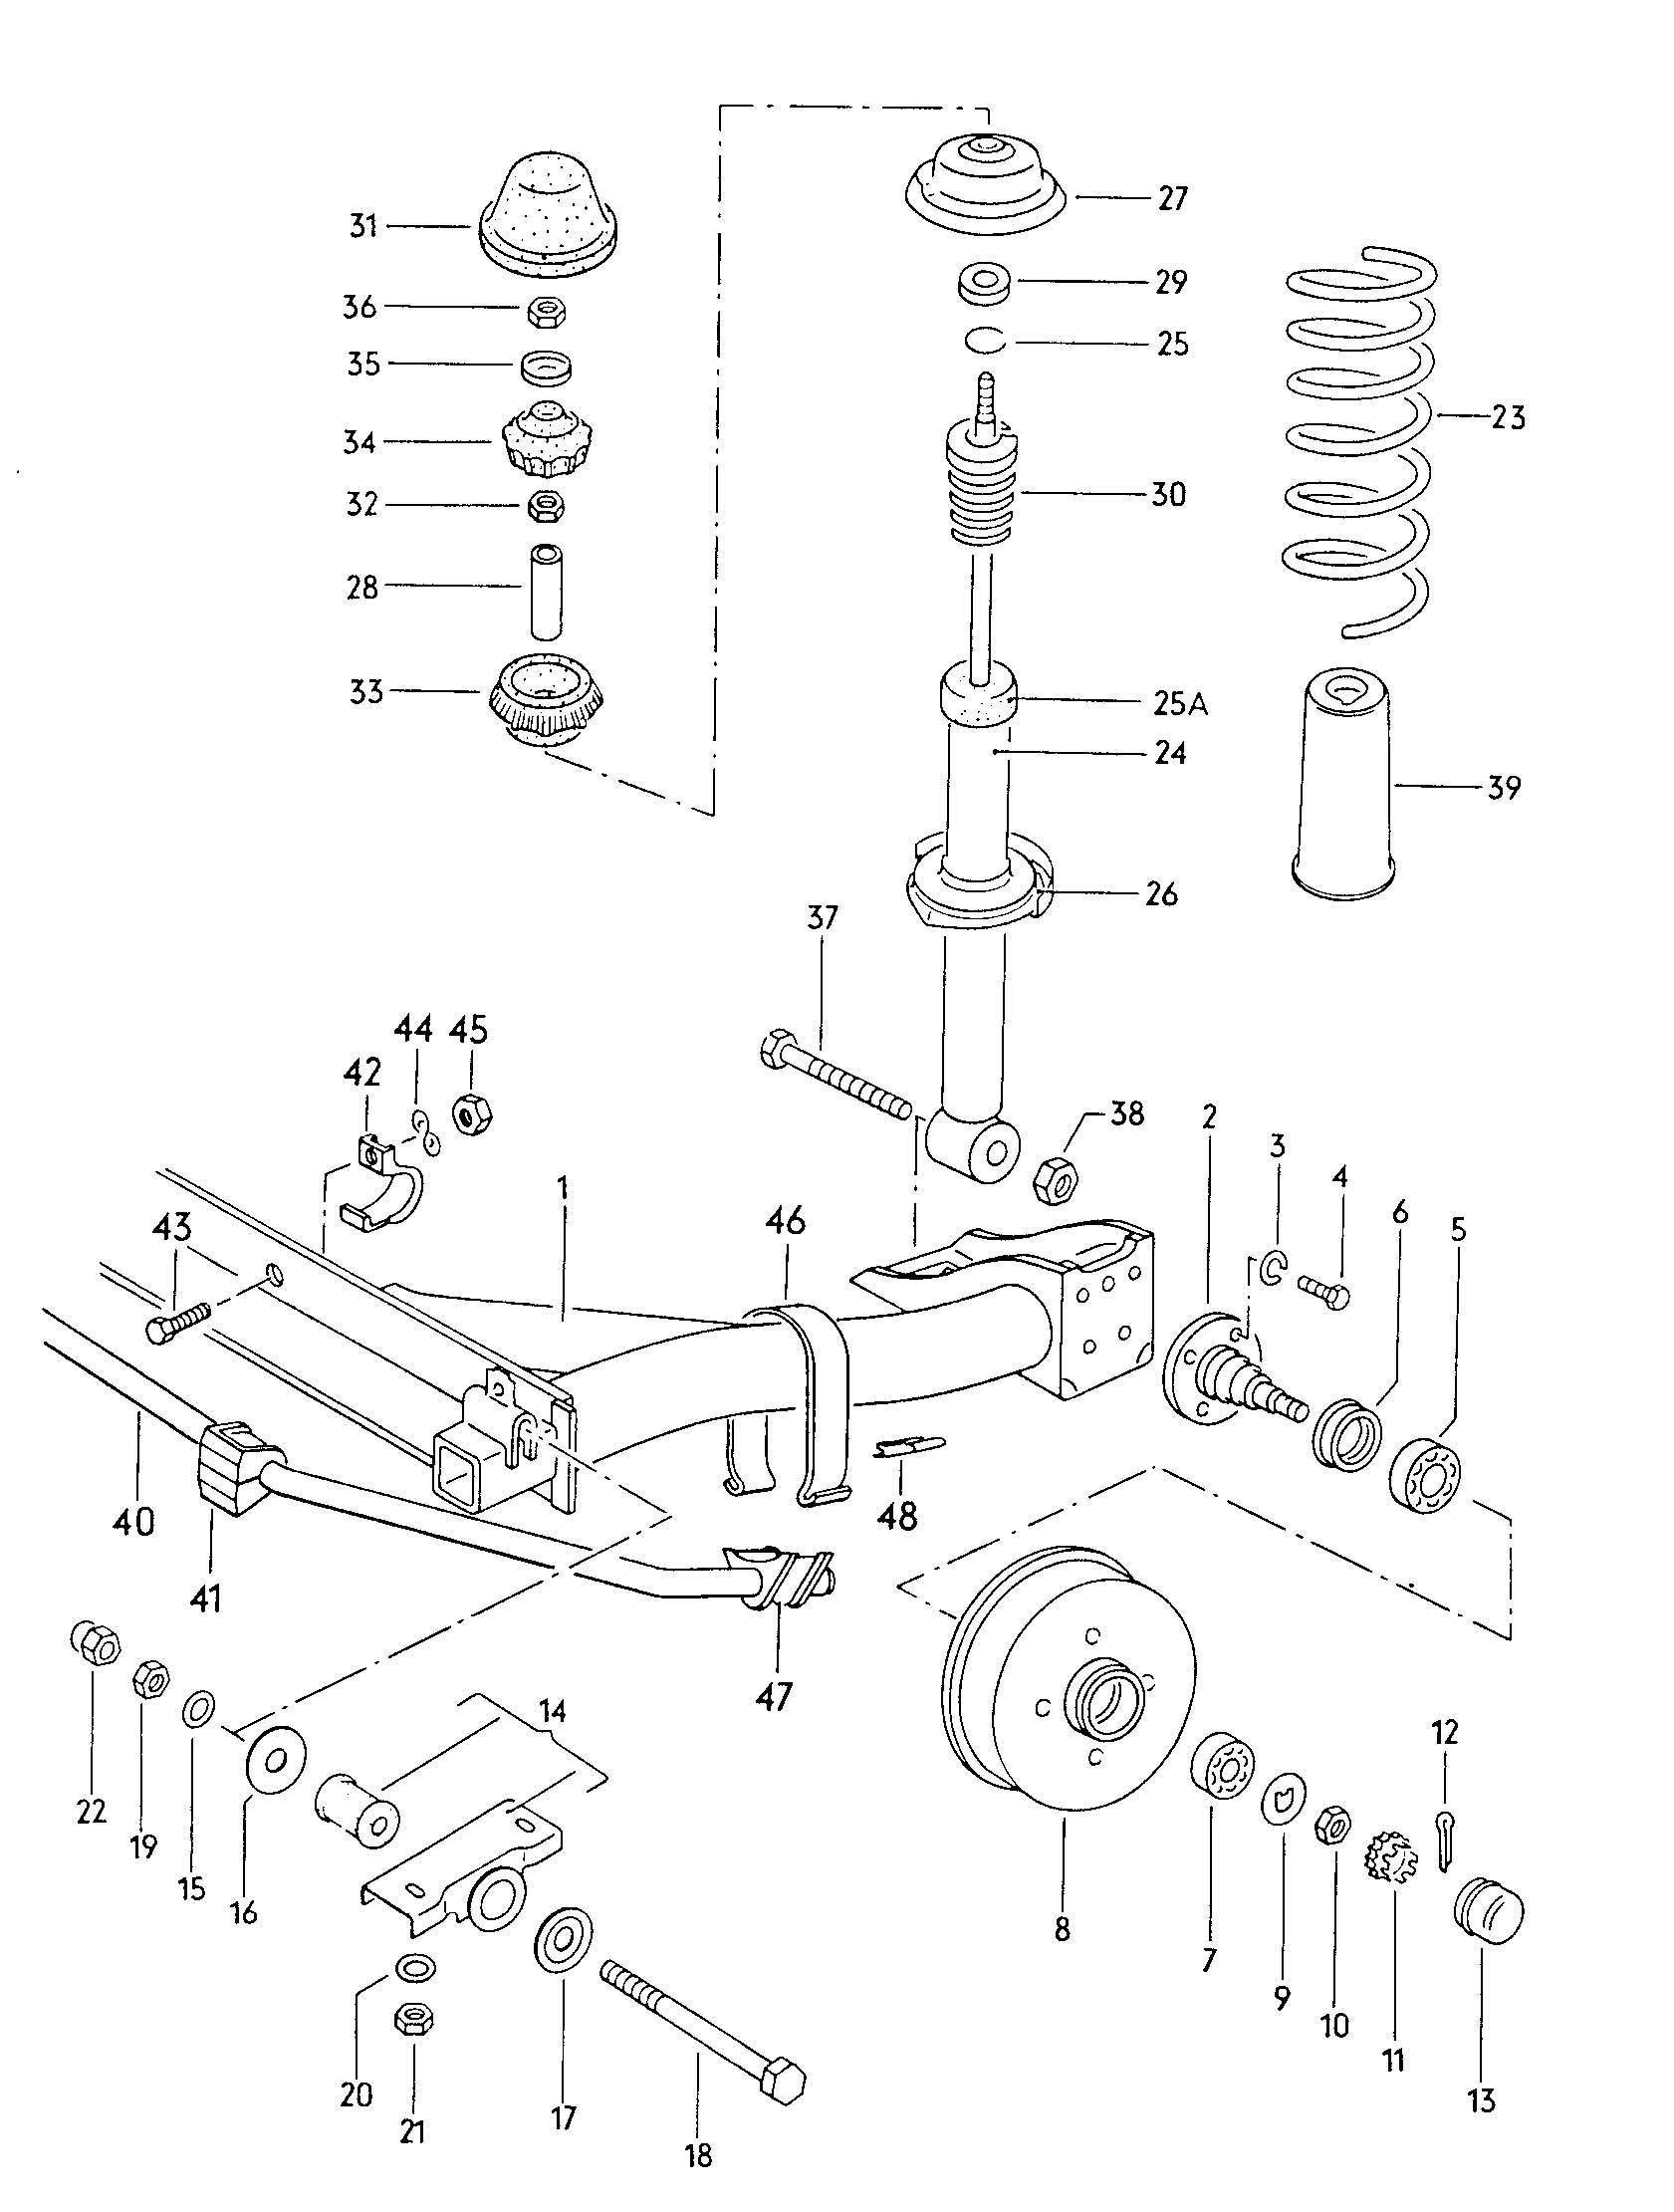 Volkswagen Rabbit Rear axle beam with attachment shock